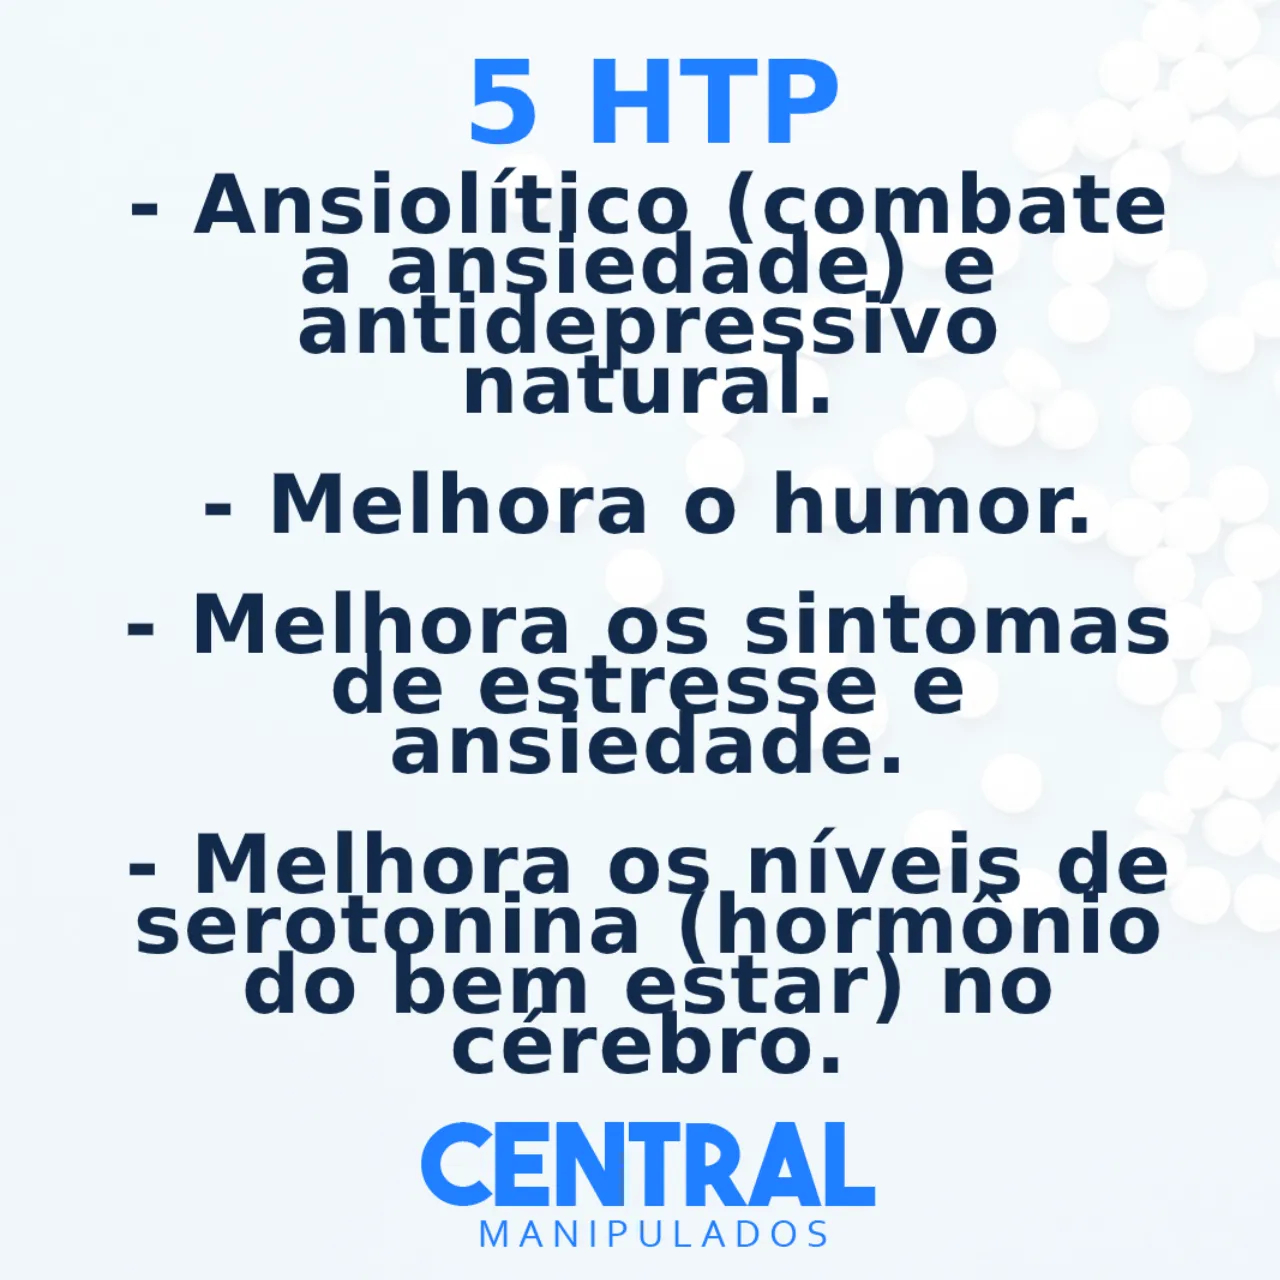 5 HTP 100mg - 60 cápsulas - Ansiolítico e antidepressivo natural